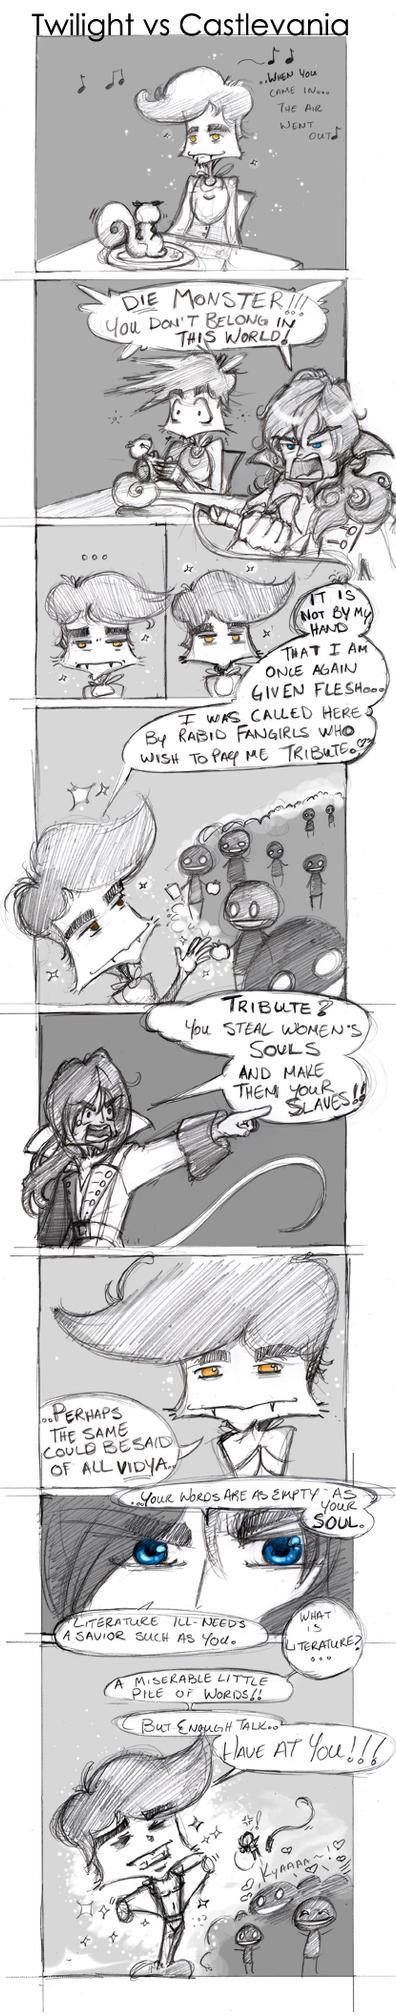 Twilight vs Castlevania by lafhaha